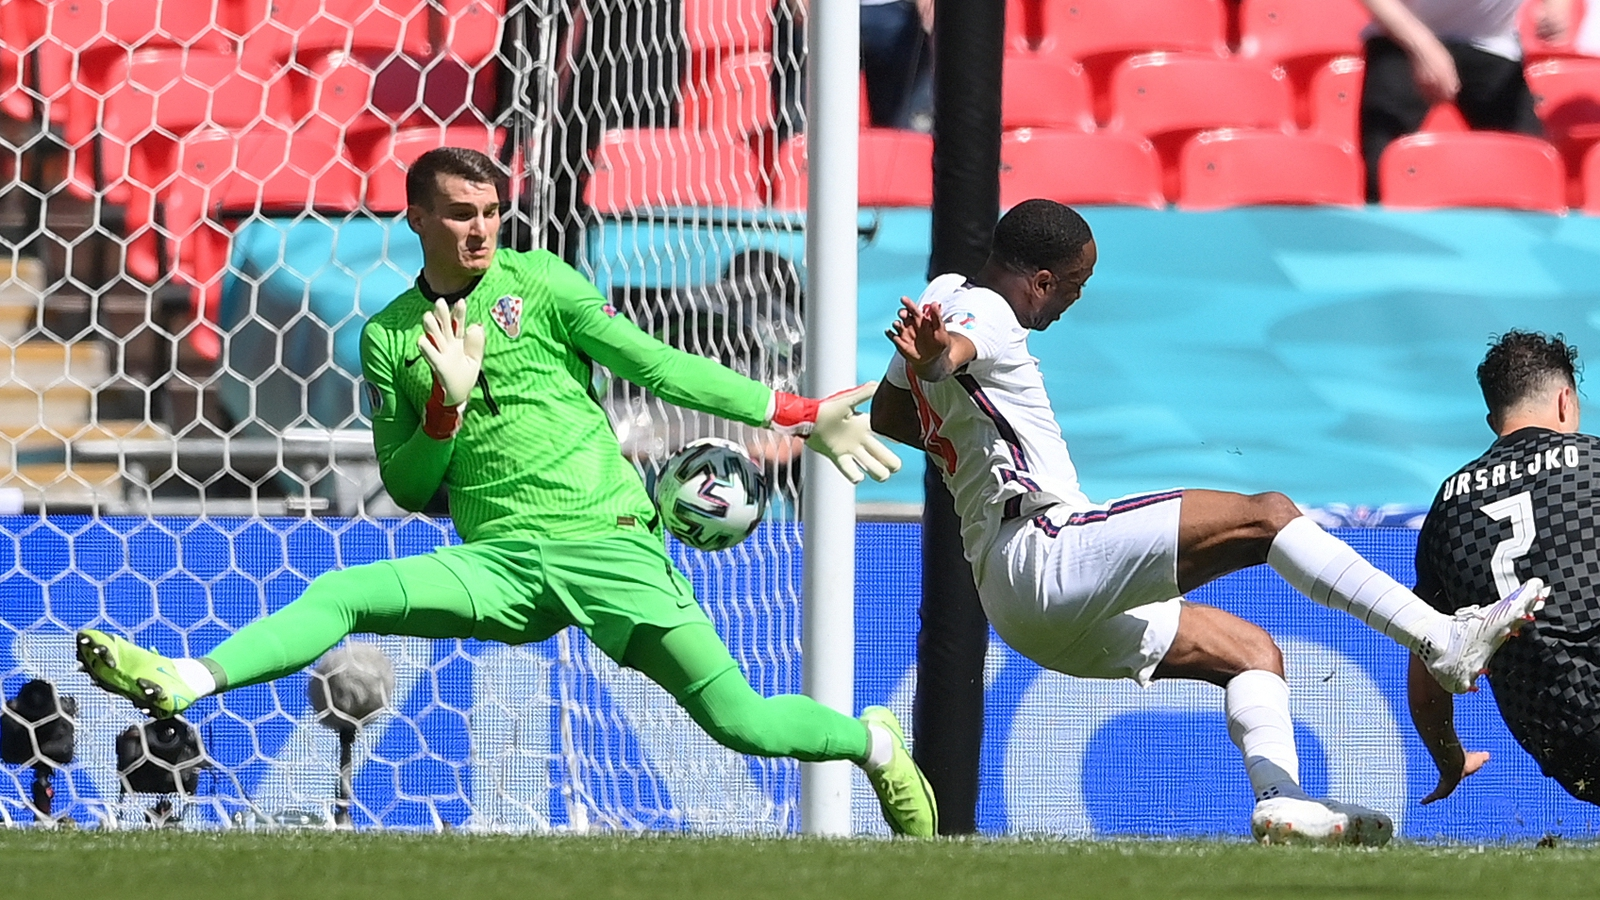 Euro 2020: England 1-0 Croatia - recap